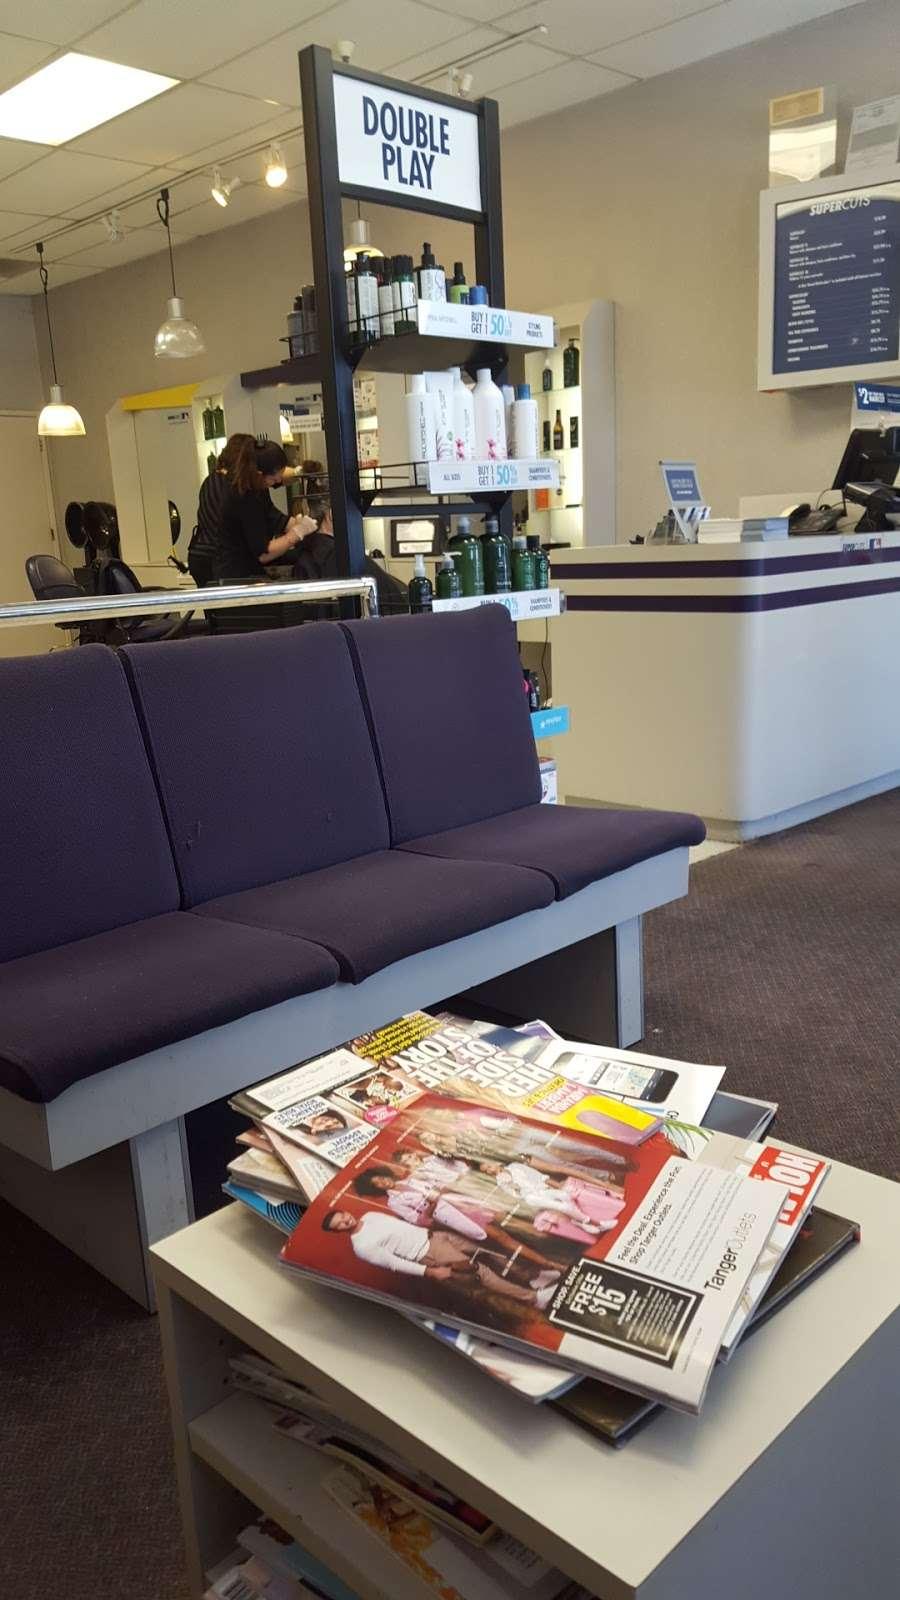 Supercuts - hair care  | Photo 1 of 3 | Address: 3033 Alamo Dr, Vacaville, CA 95687, USA | Phone: (707) 446-9673